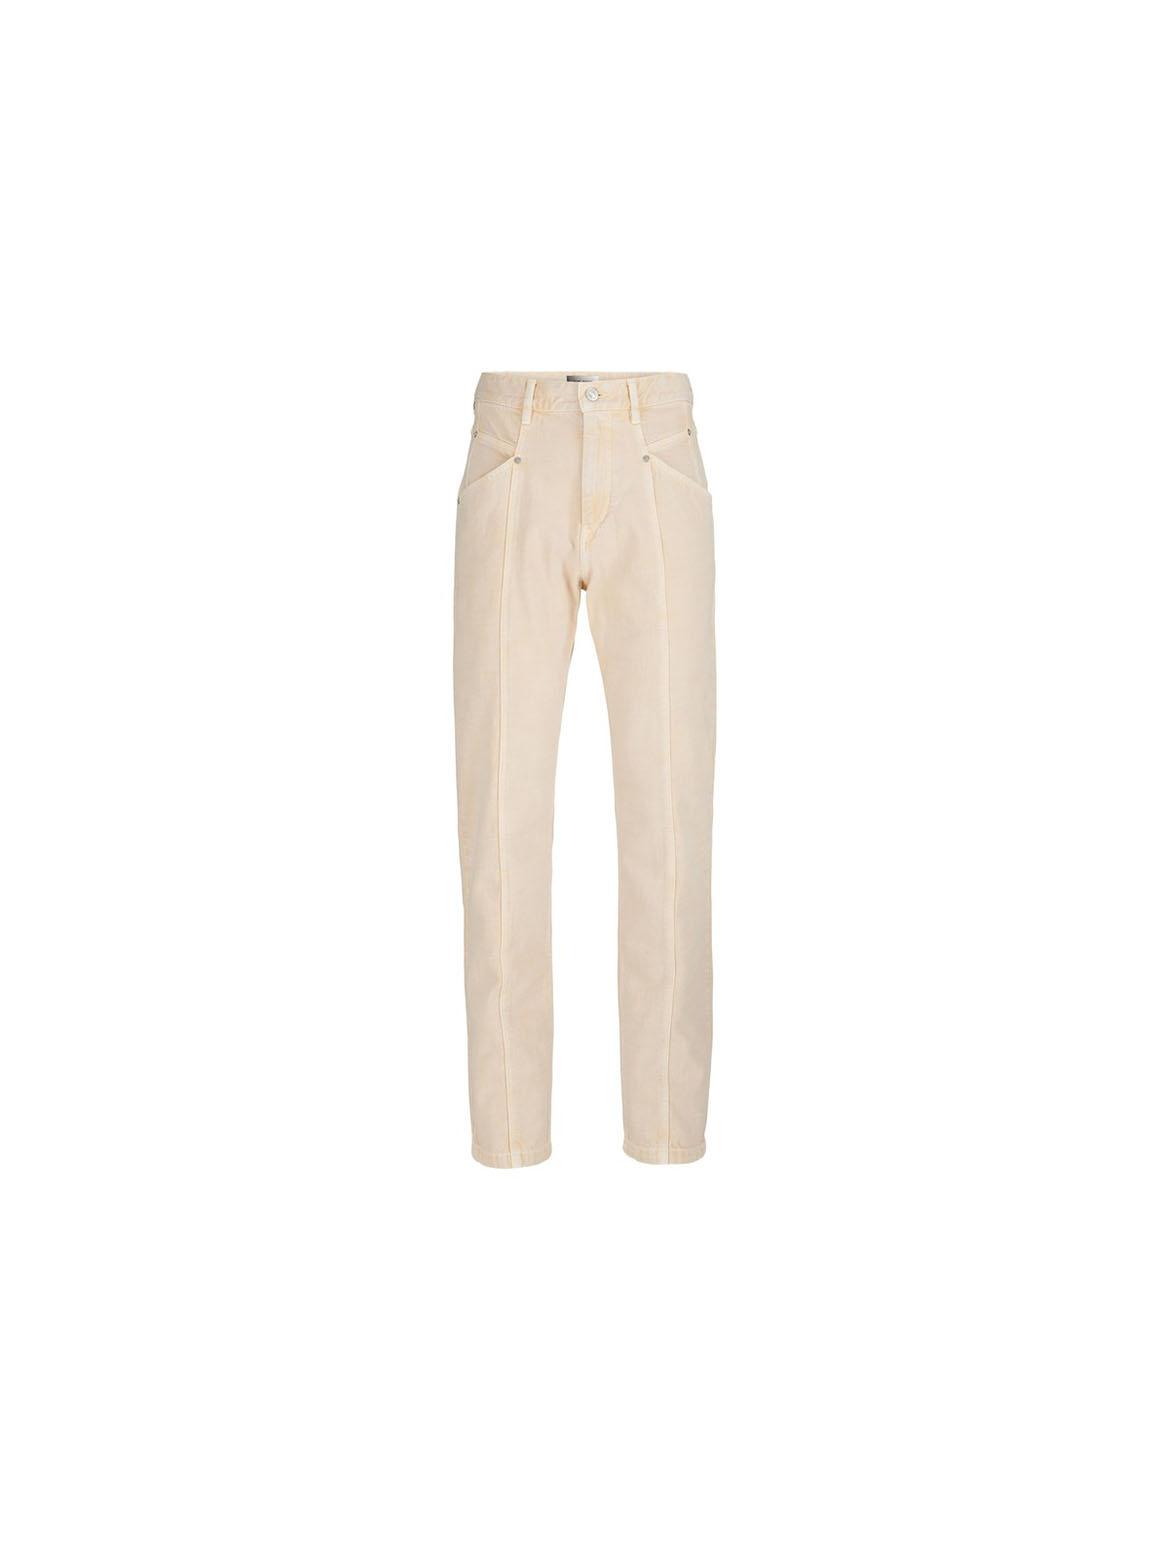 Jackomosr pants